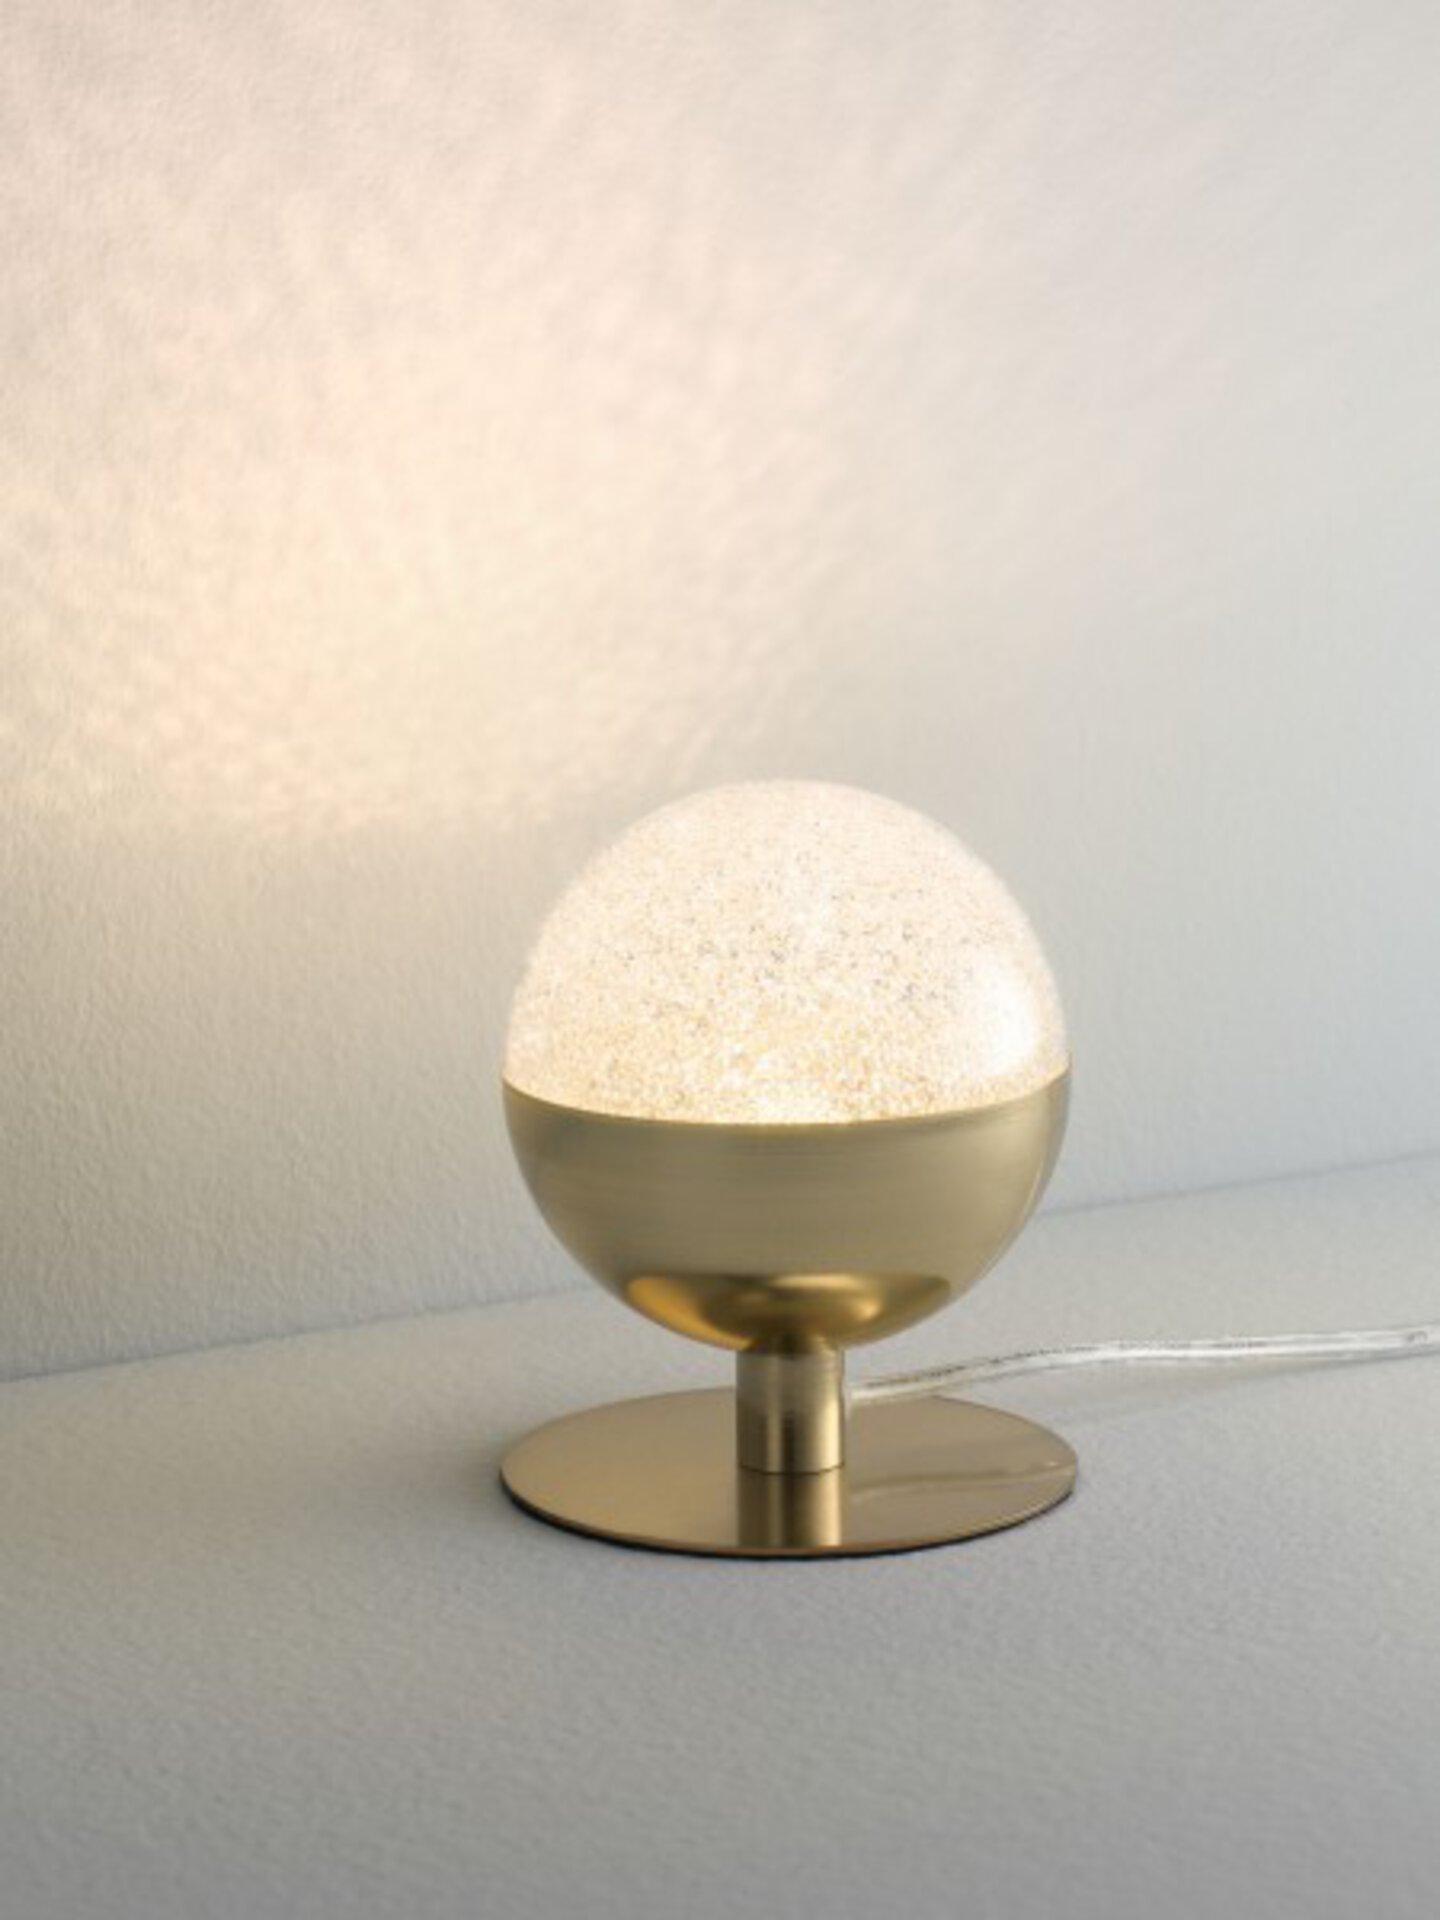 Tischleuchte Mira Casa Nova Metall gold 10 x 13 x 10 cm